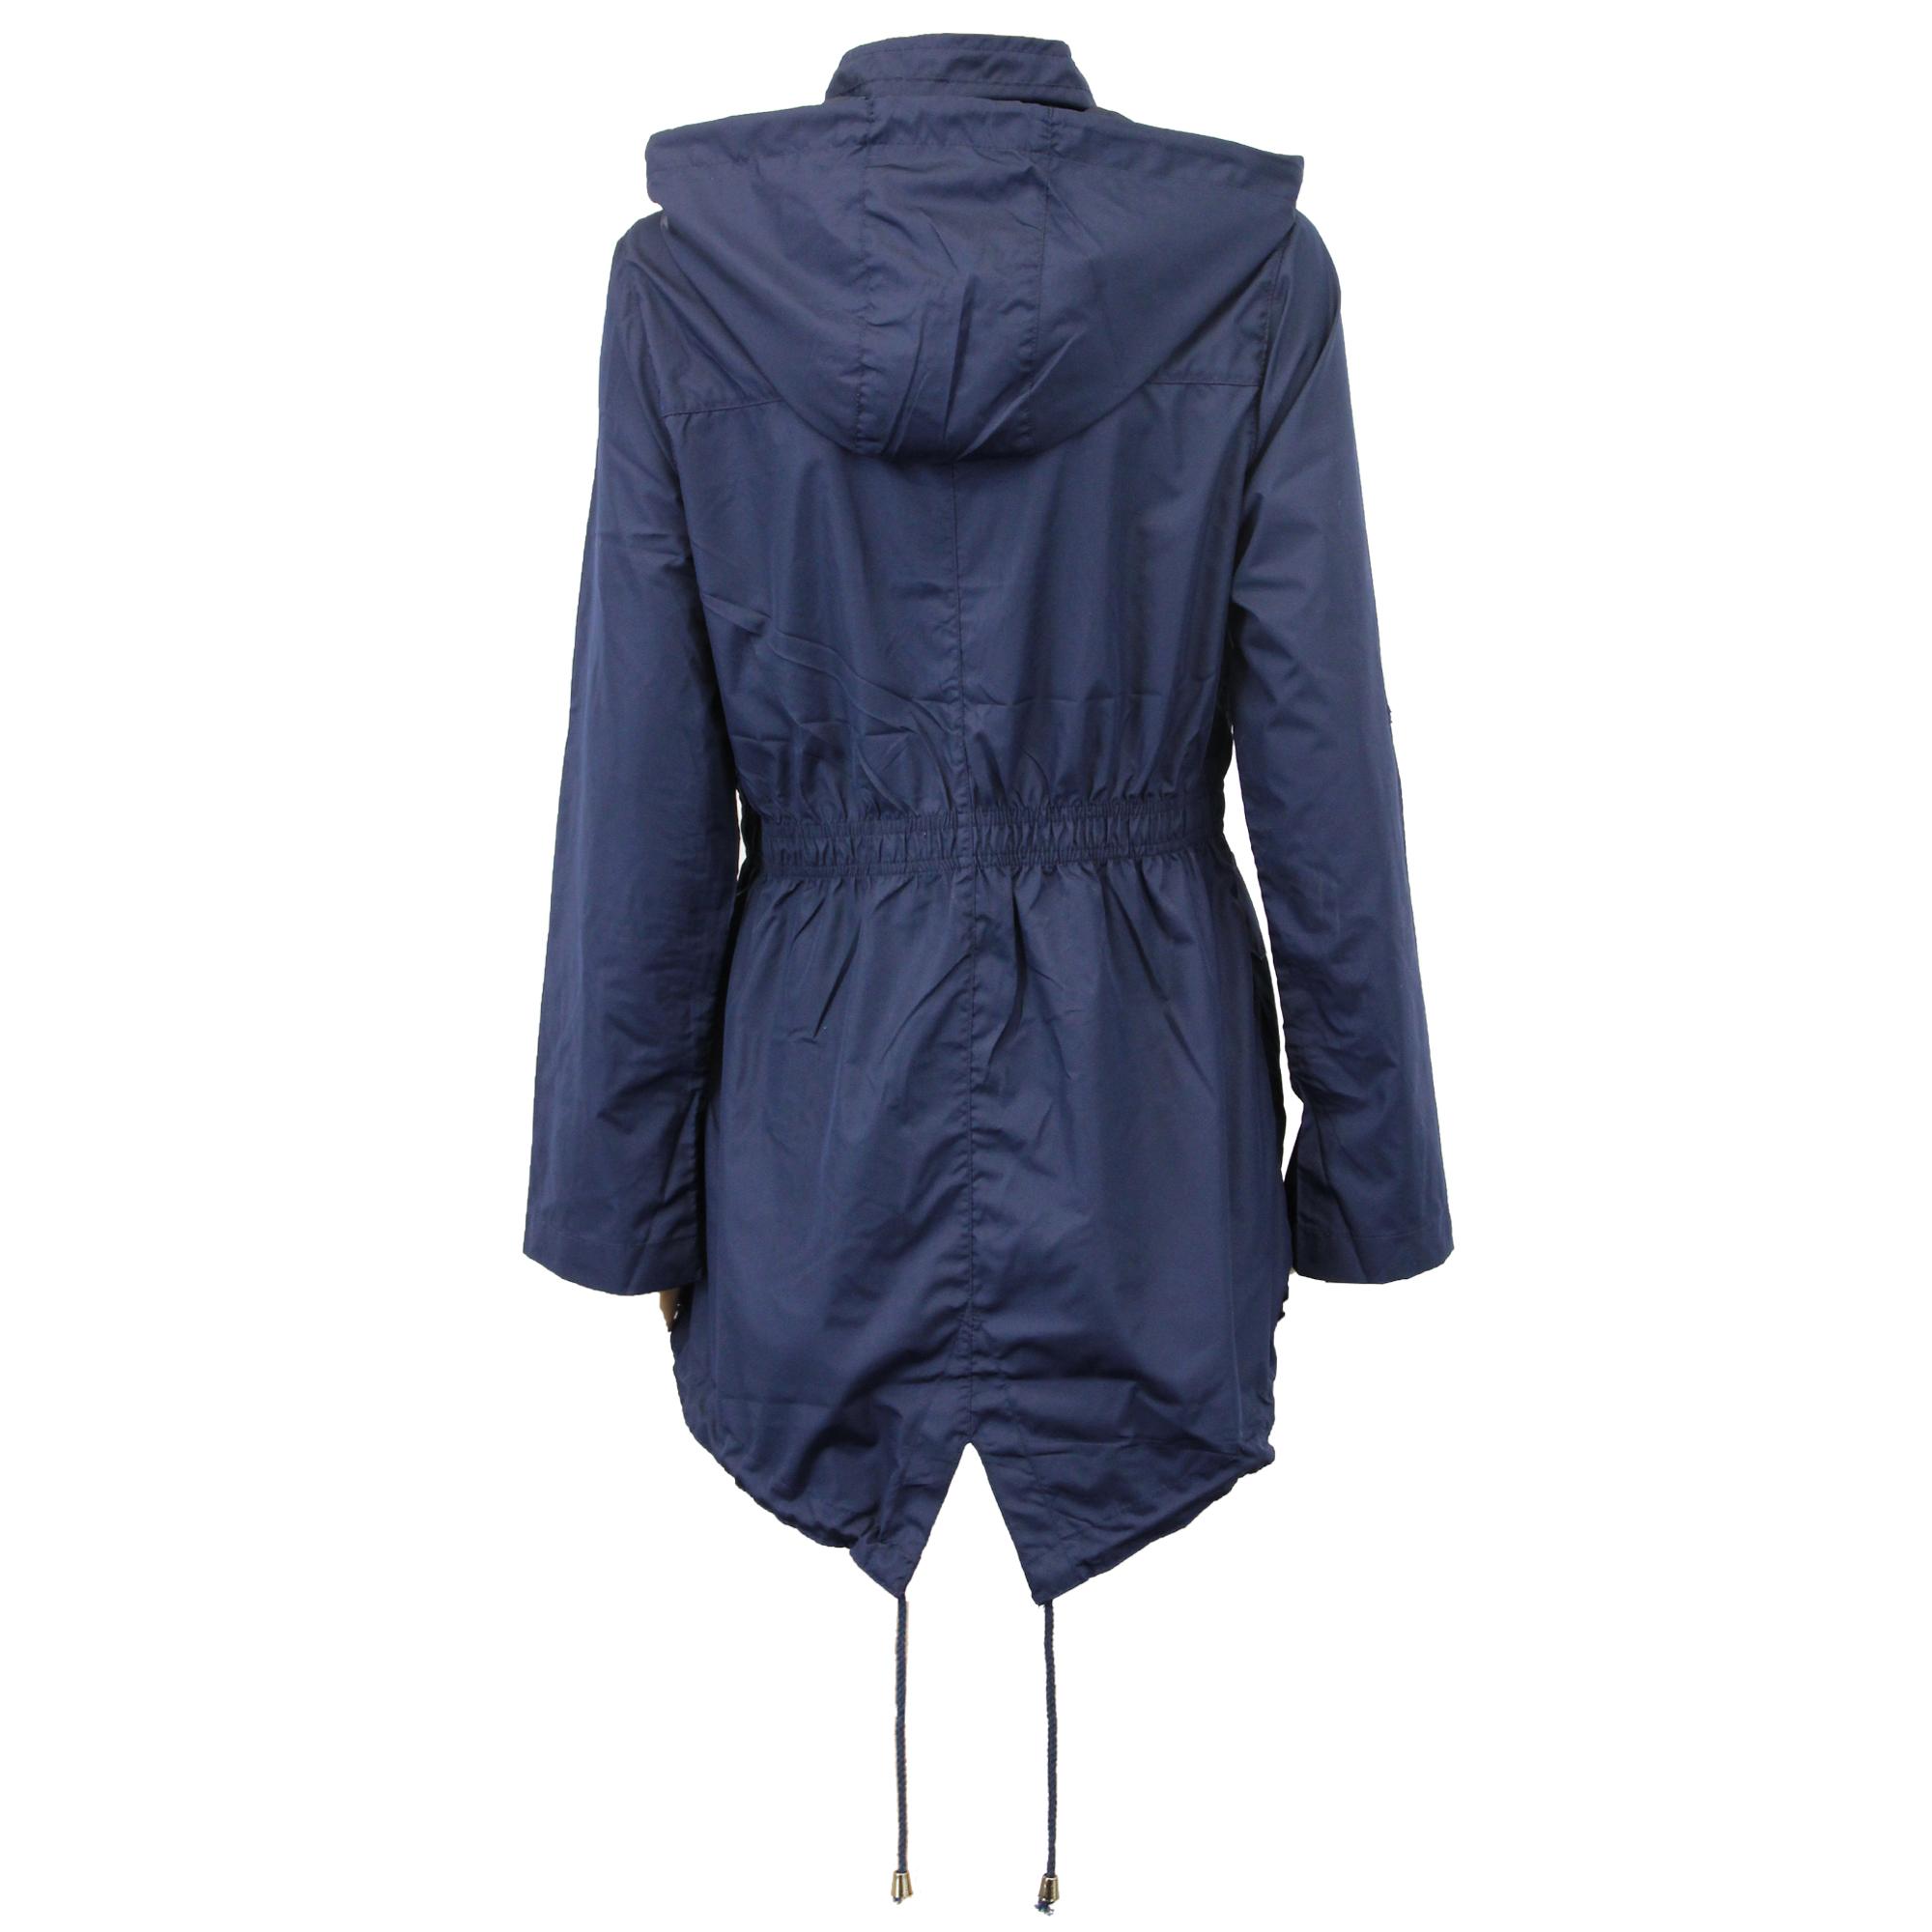 ladies jacket brave soul womens coat hooded fish tail. Black Bedroom Furniture Sets. Home Design Ideas